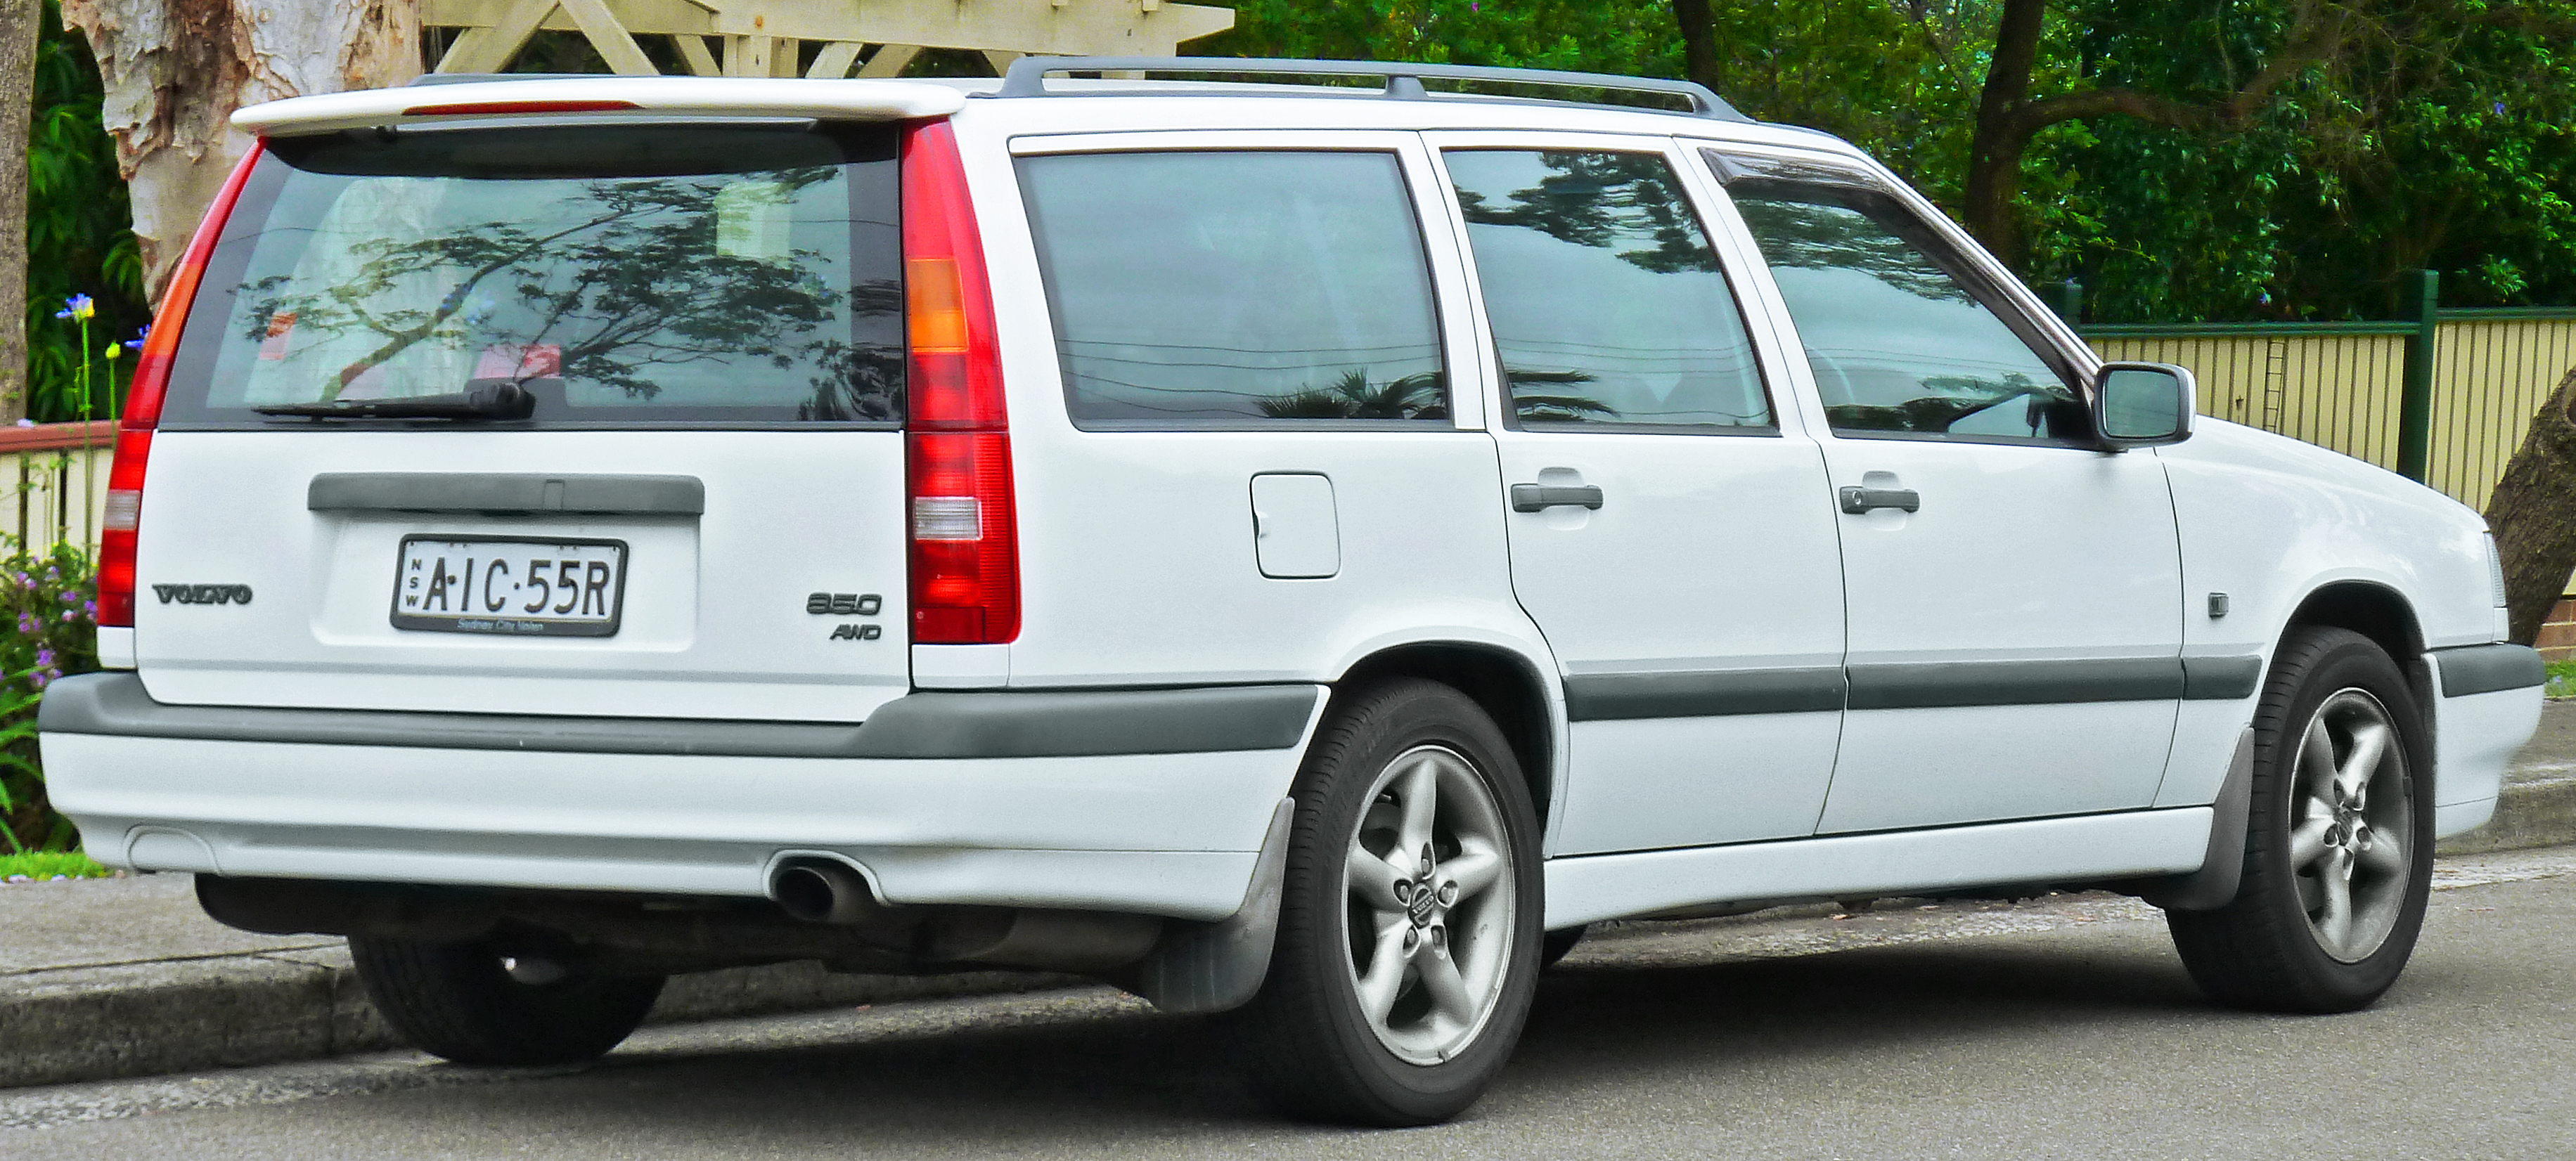 File 1996 1997 Volvo 850 Awd Station Wagon 2011 11 18 02